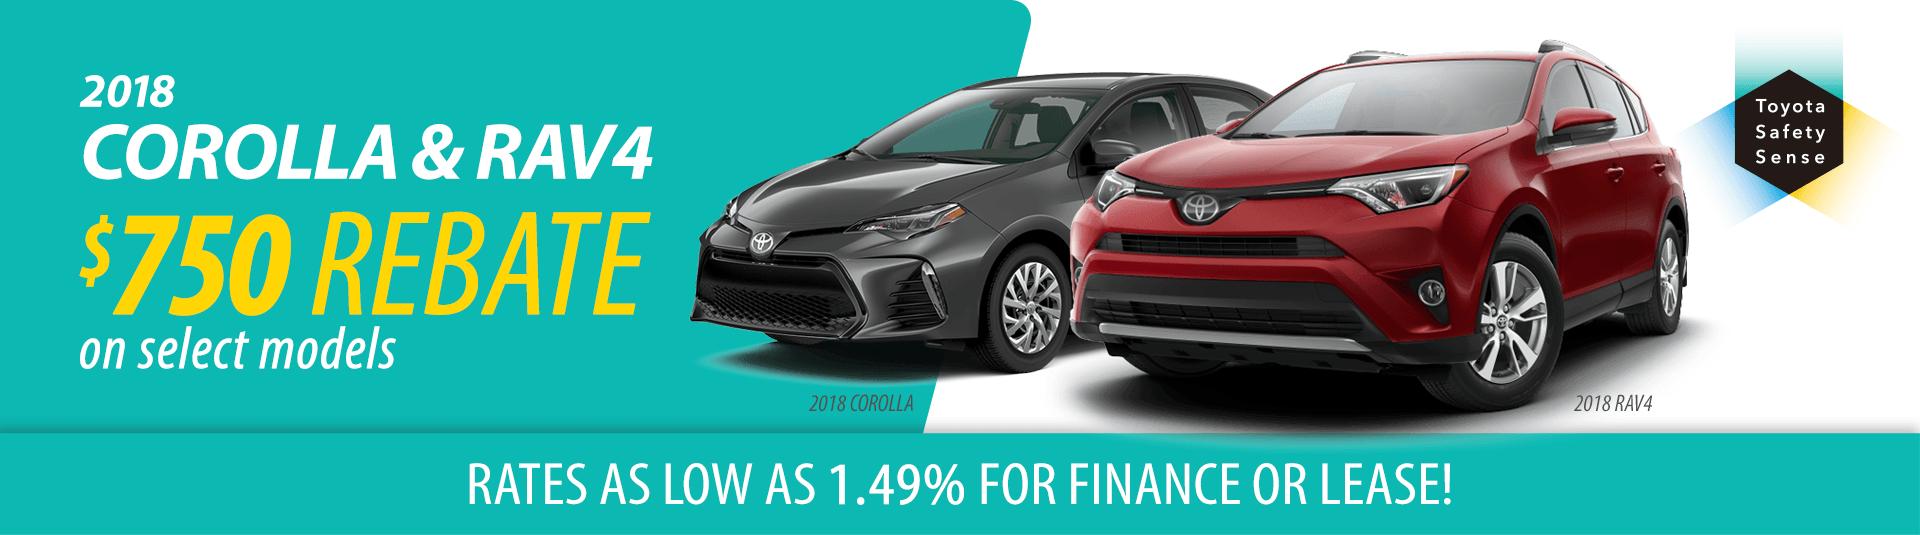 2018 Toyota RAV4 and Corolla Offers